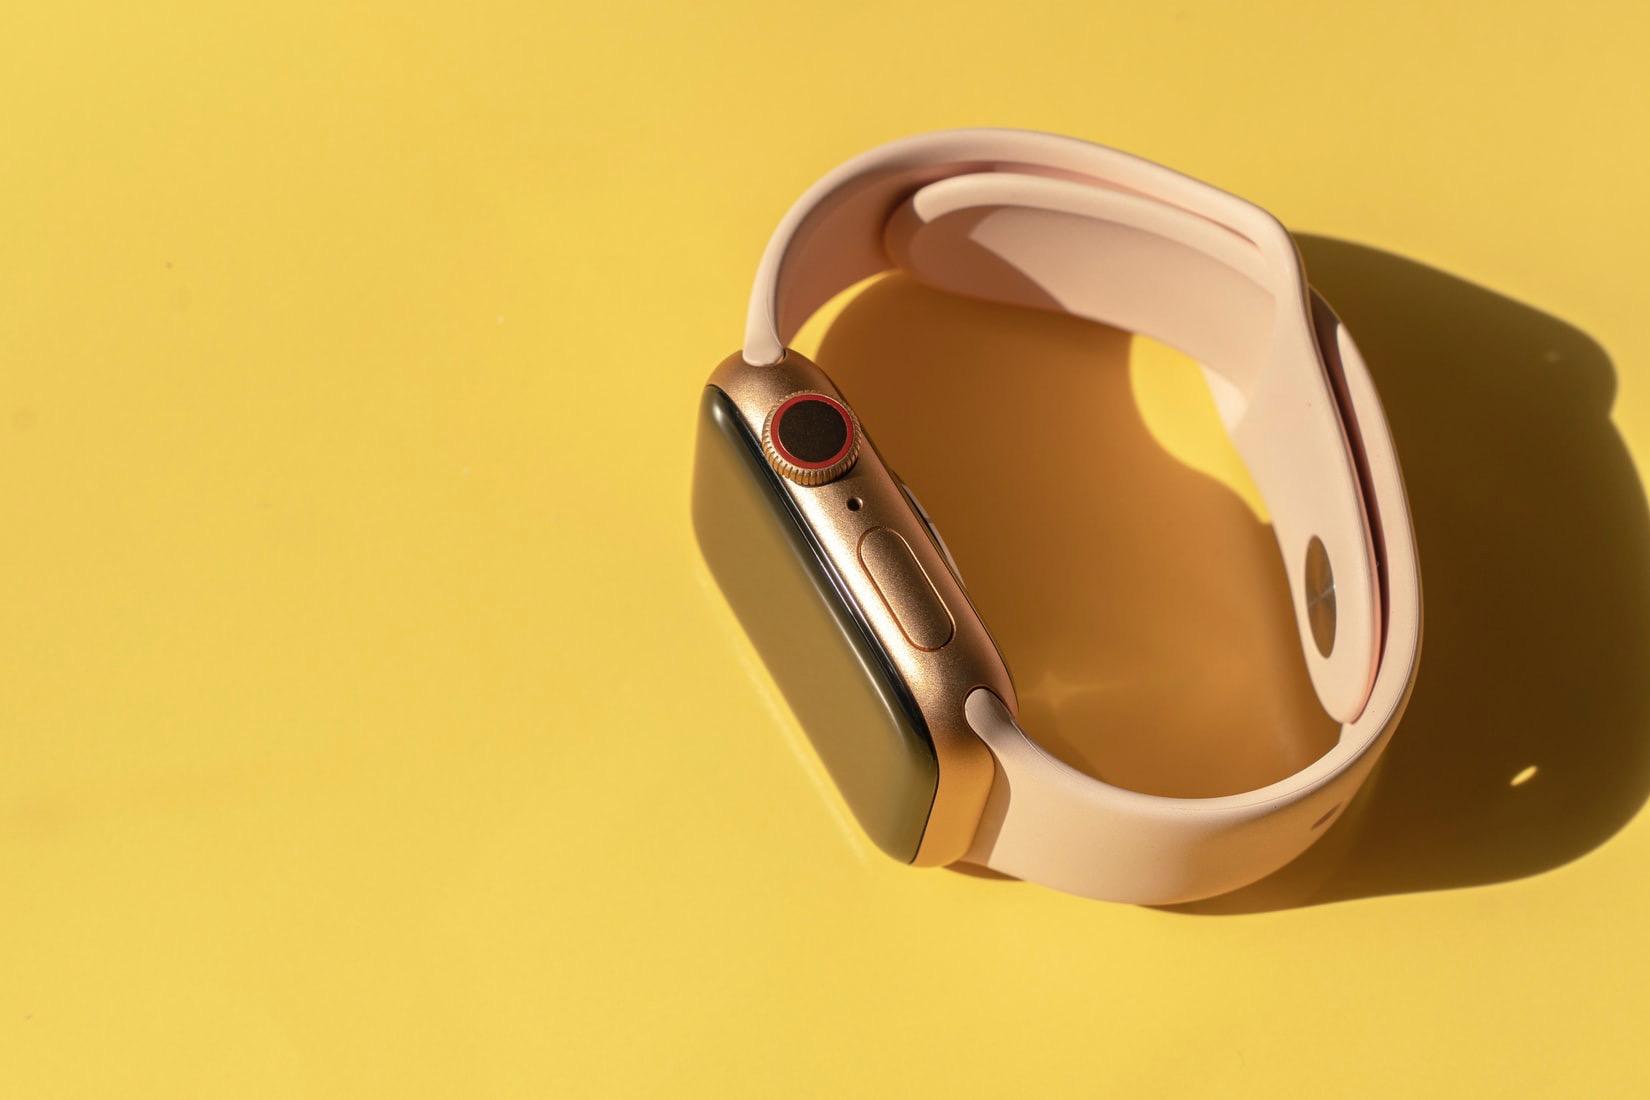 Apple Watch推出国际系列表带:代表全球22个国家-november 主题